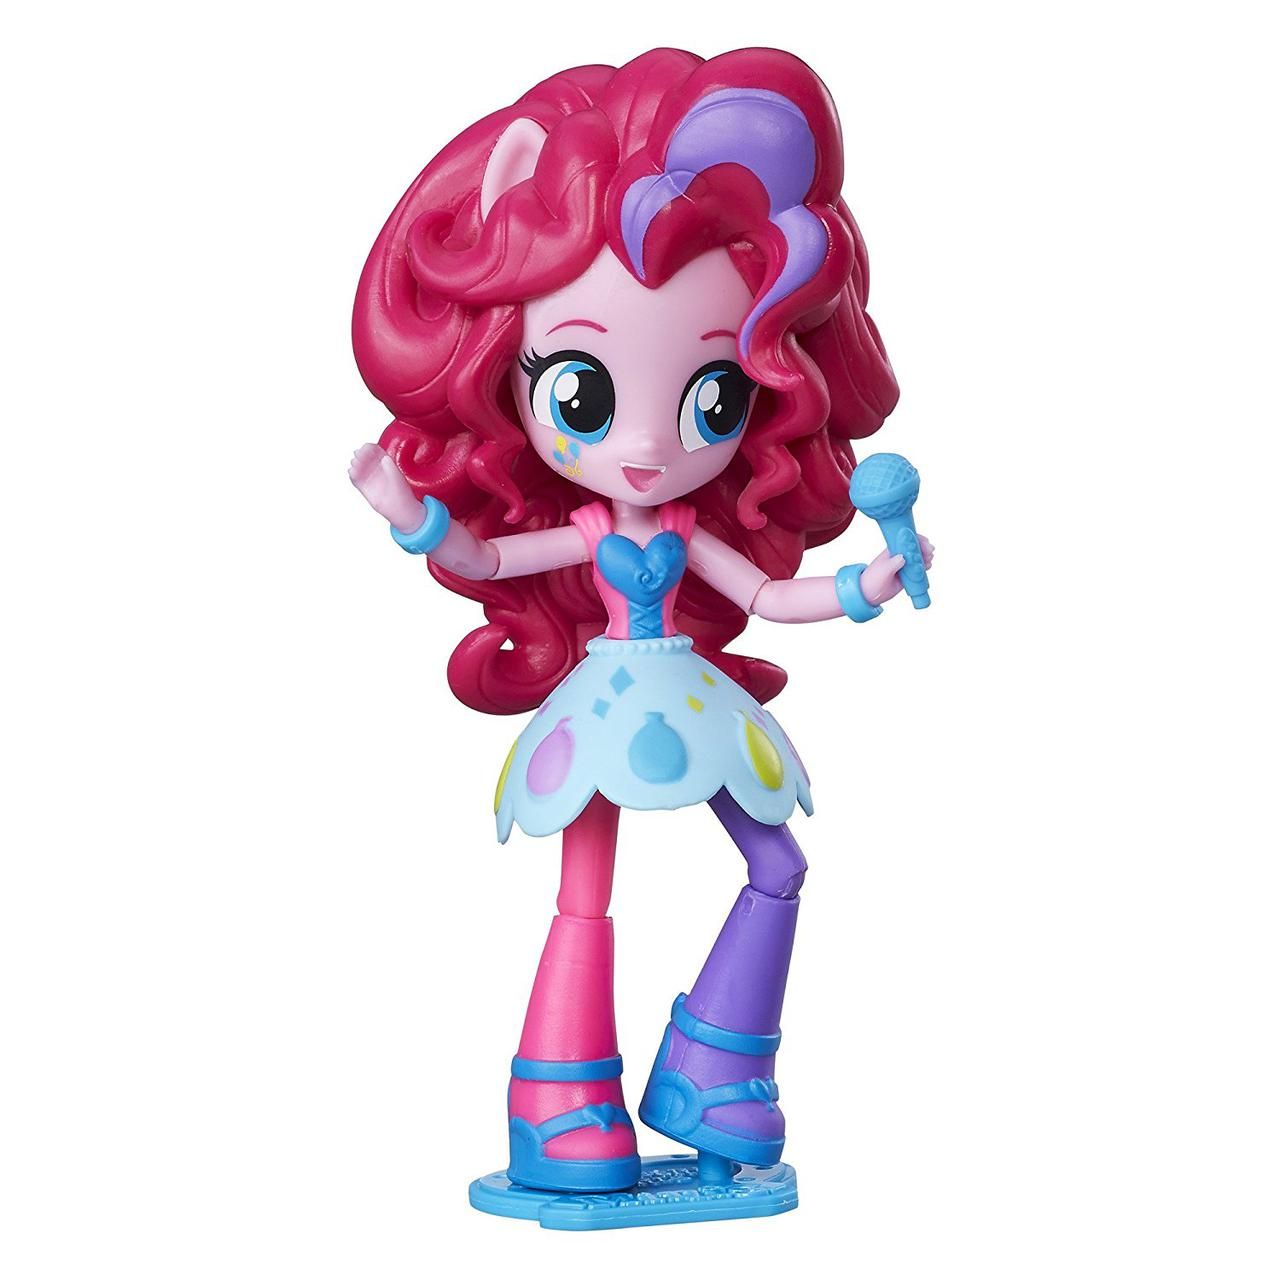 My Little Pony Пинки Пай Радужный рок мини девочки Эквестрии Equestria Girls Minis Pinkie Pie